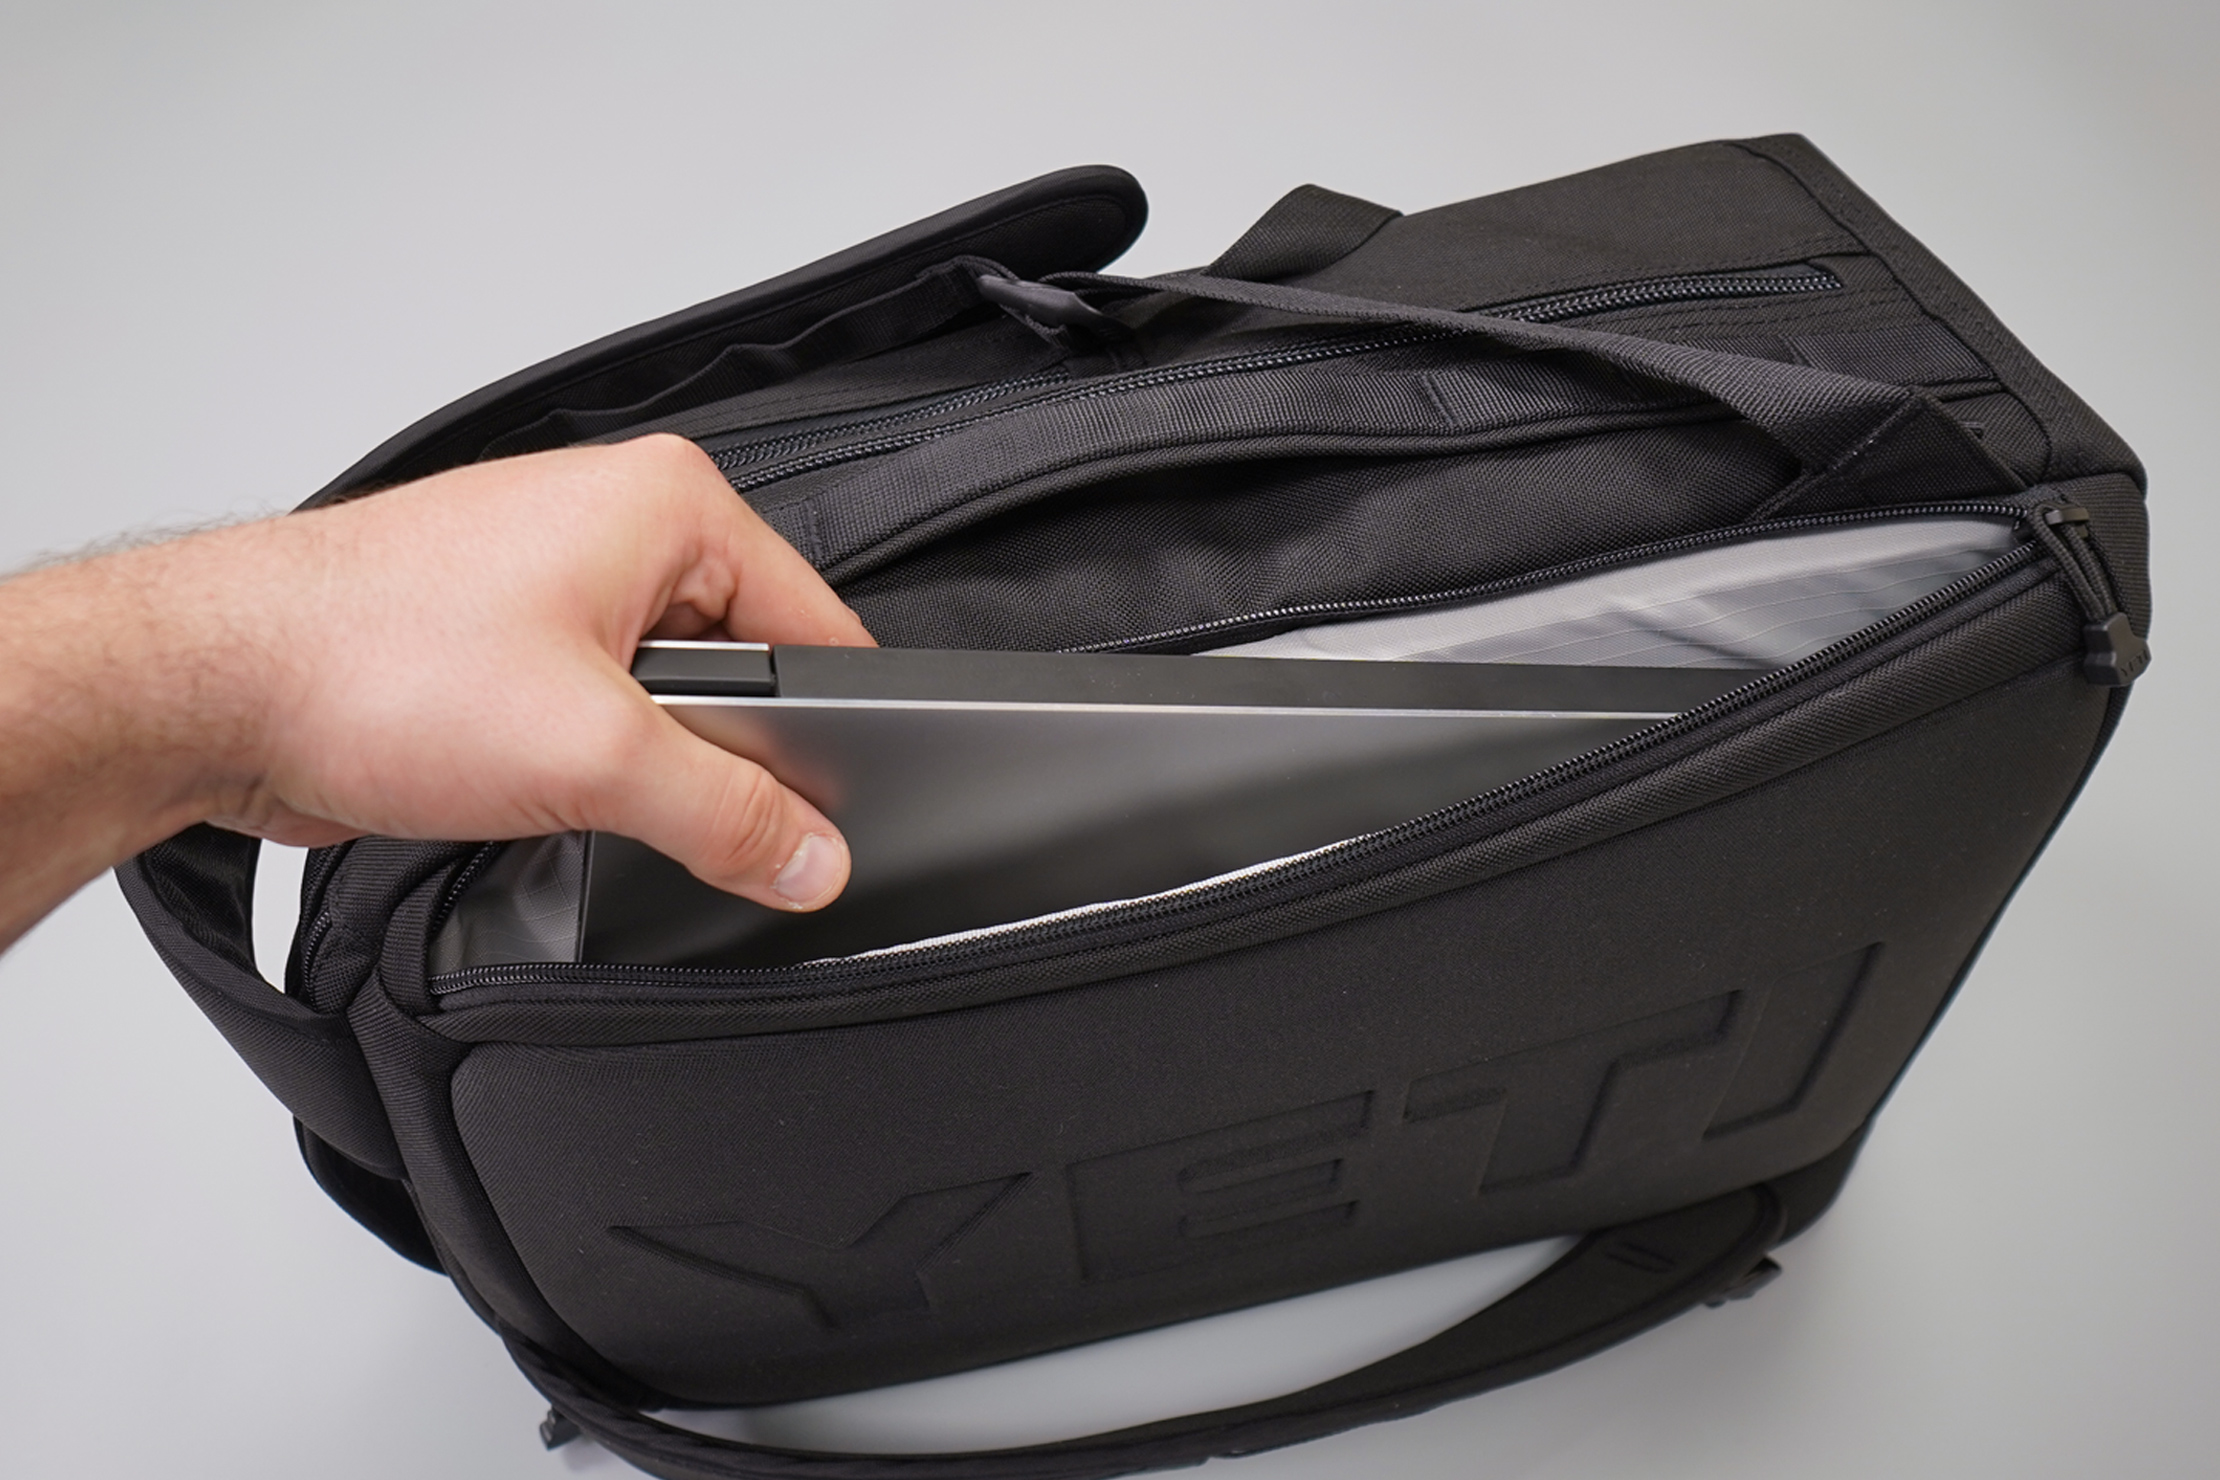 YETI Tocayo Laptop Compartment